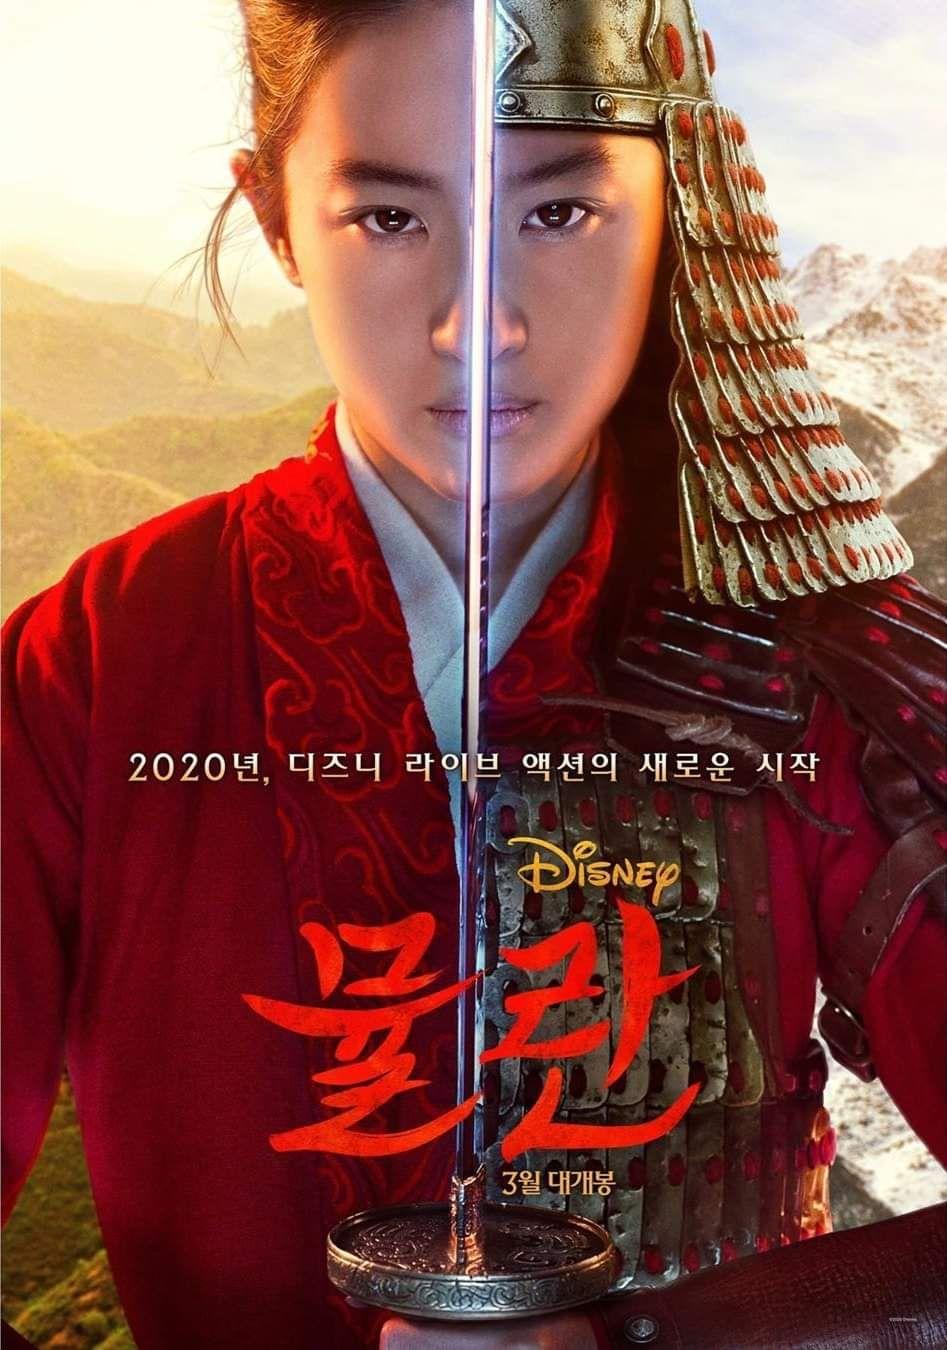 Pin by Lilia 🏳️🌈 on ความบันเทิง in 2020 | Mulan movie, Watch mulan, Mulan